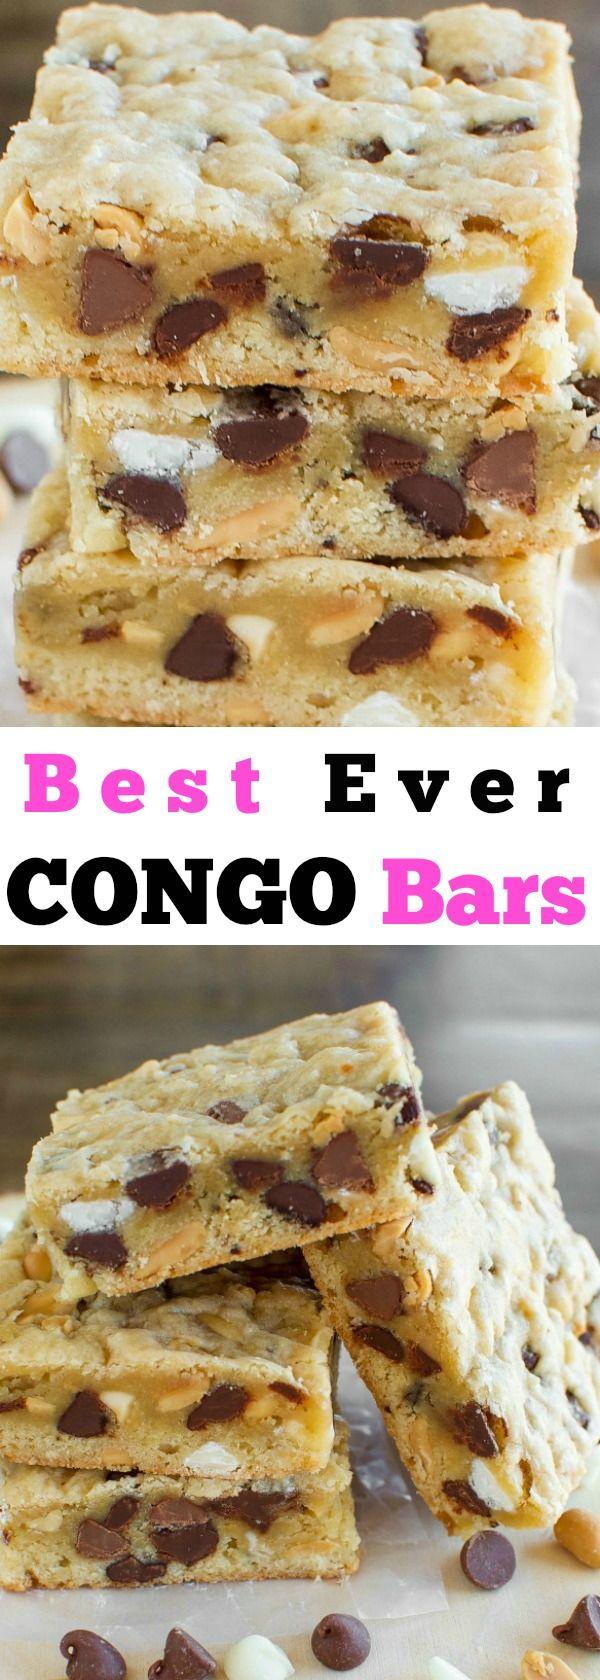 ... Nom Nom Nom | Pinterest | Congo bars, Dessert bars and Cookie bars